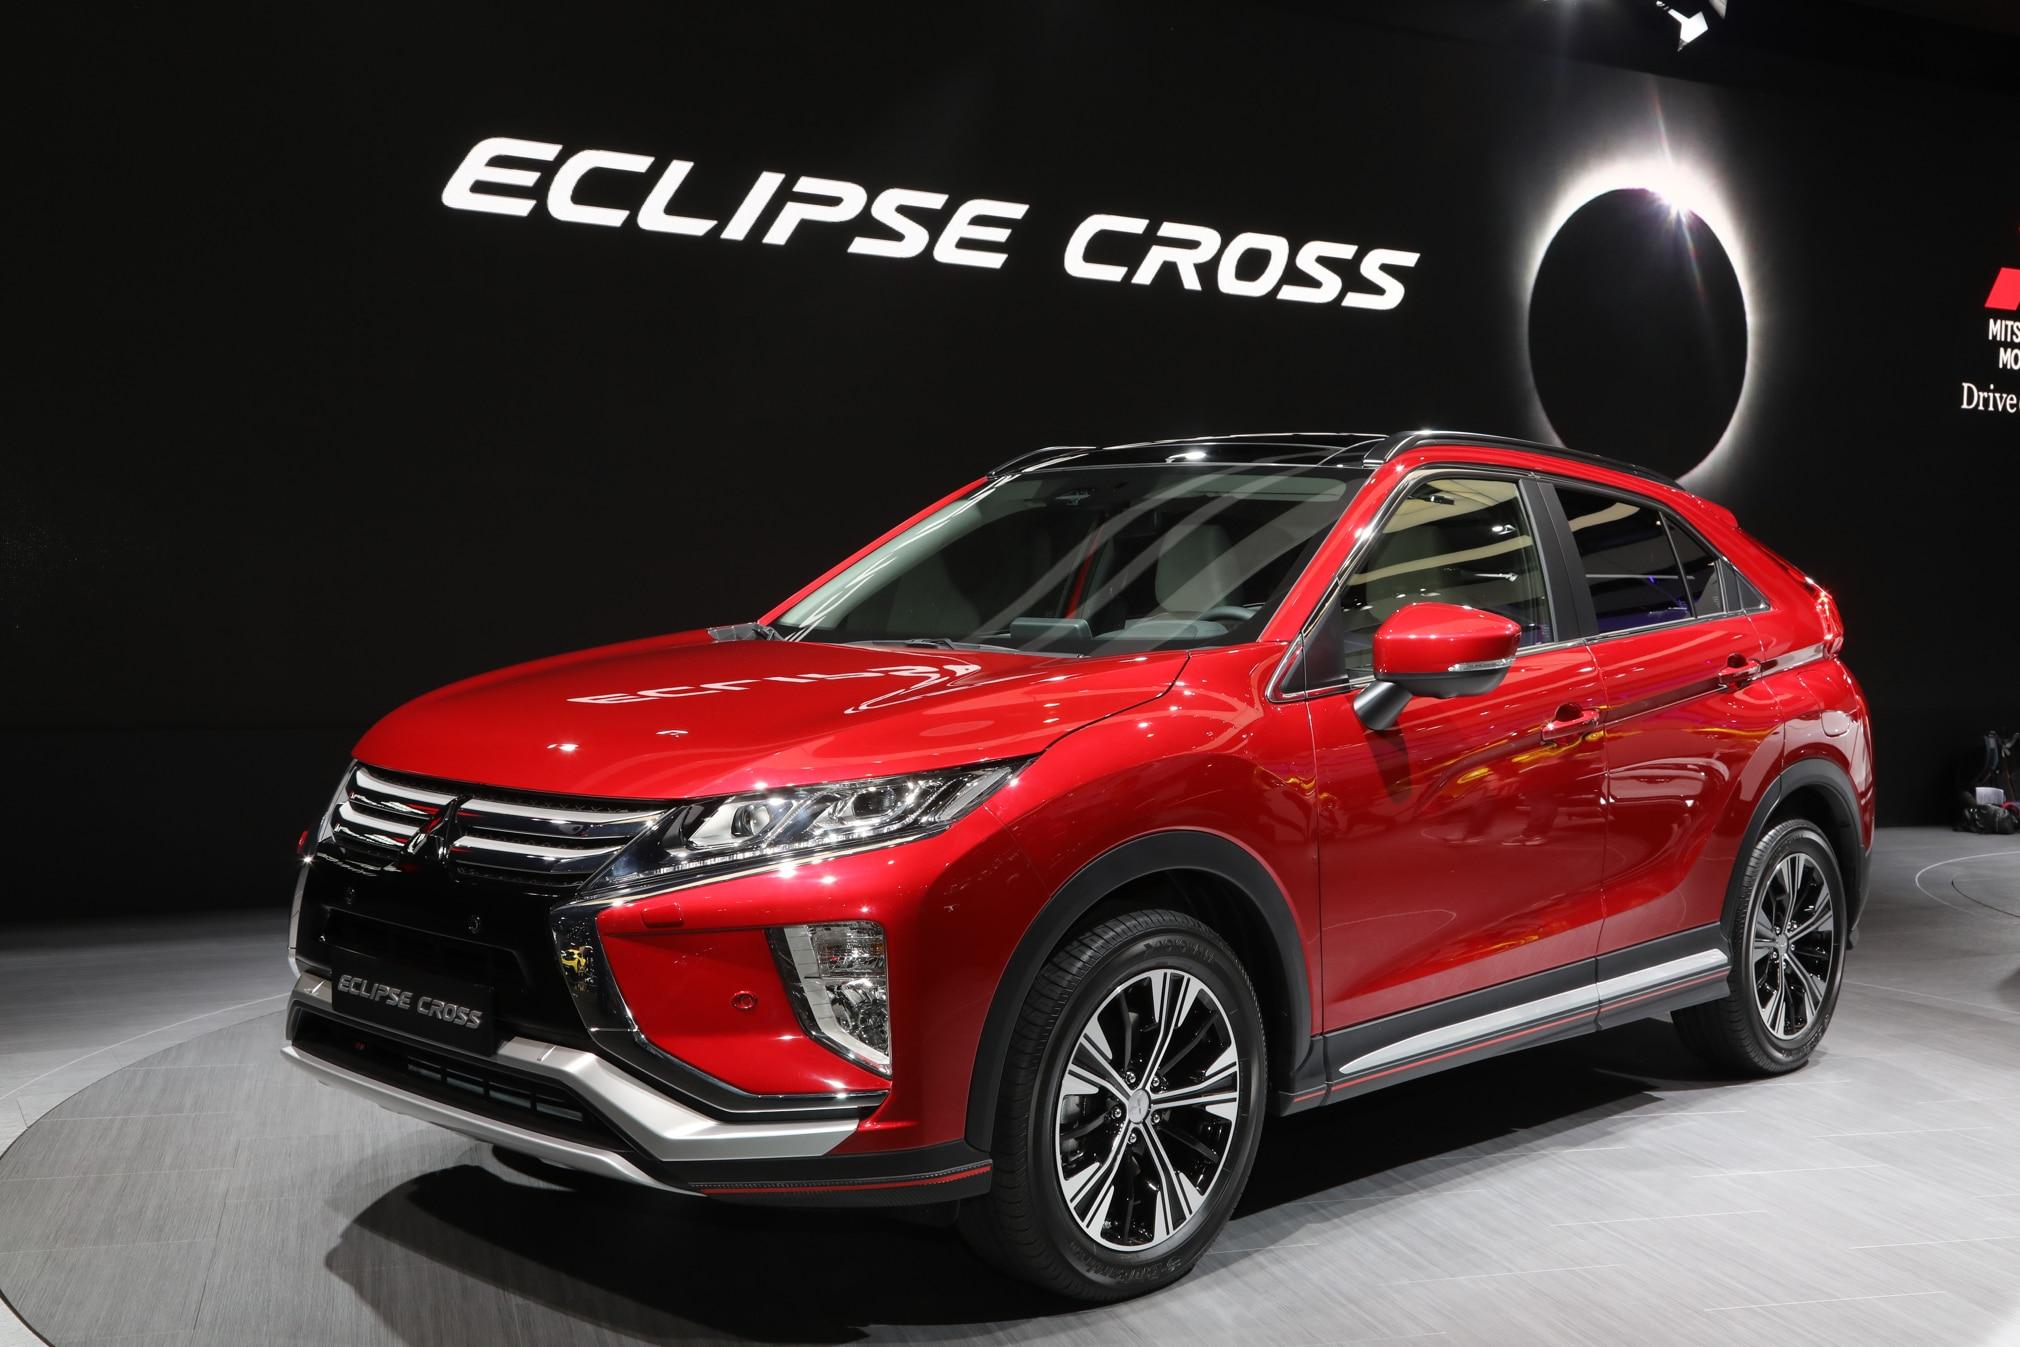 Mitsubishi Eclipse Cross Front Three Quarter